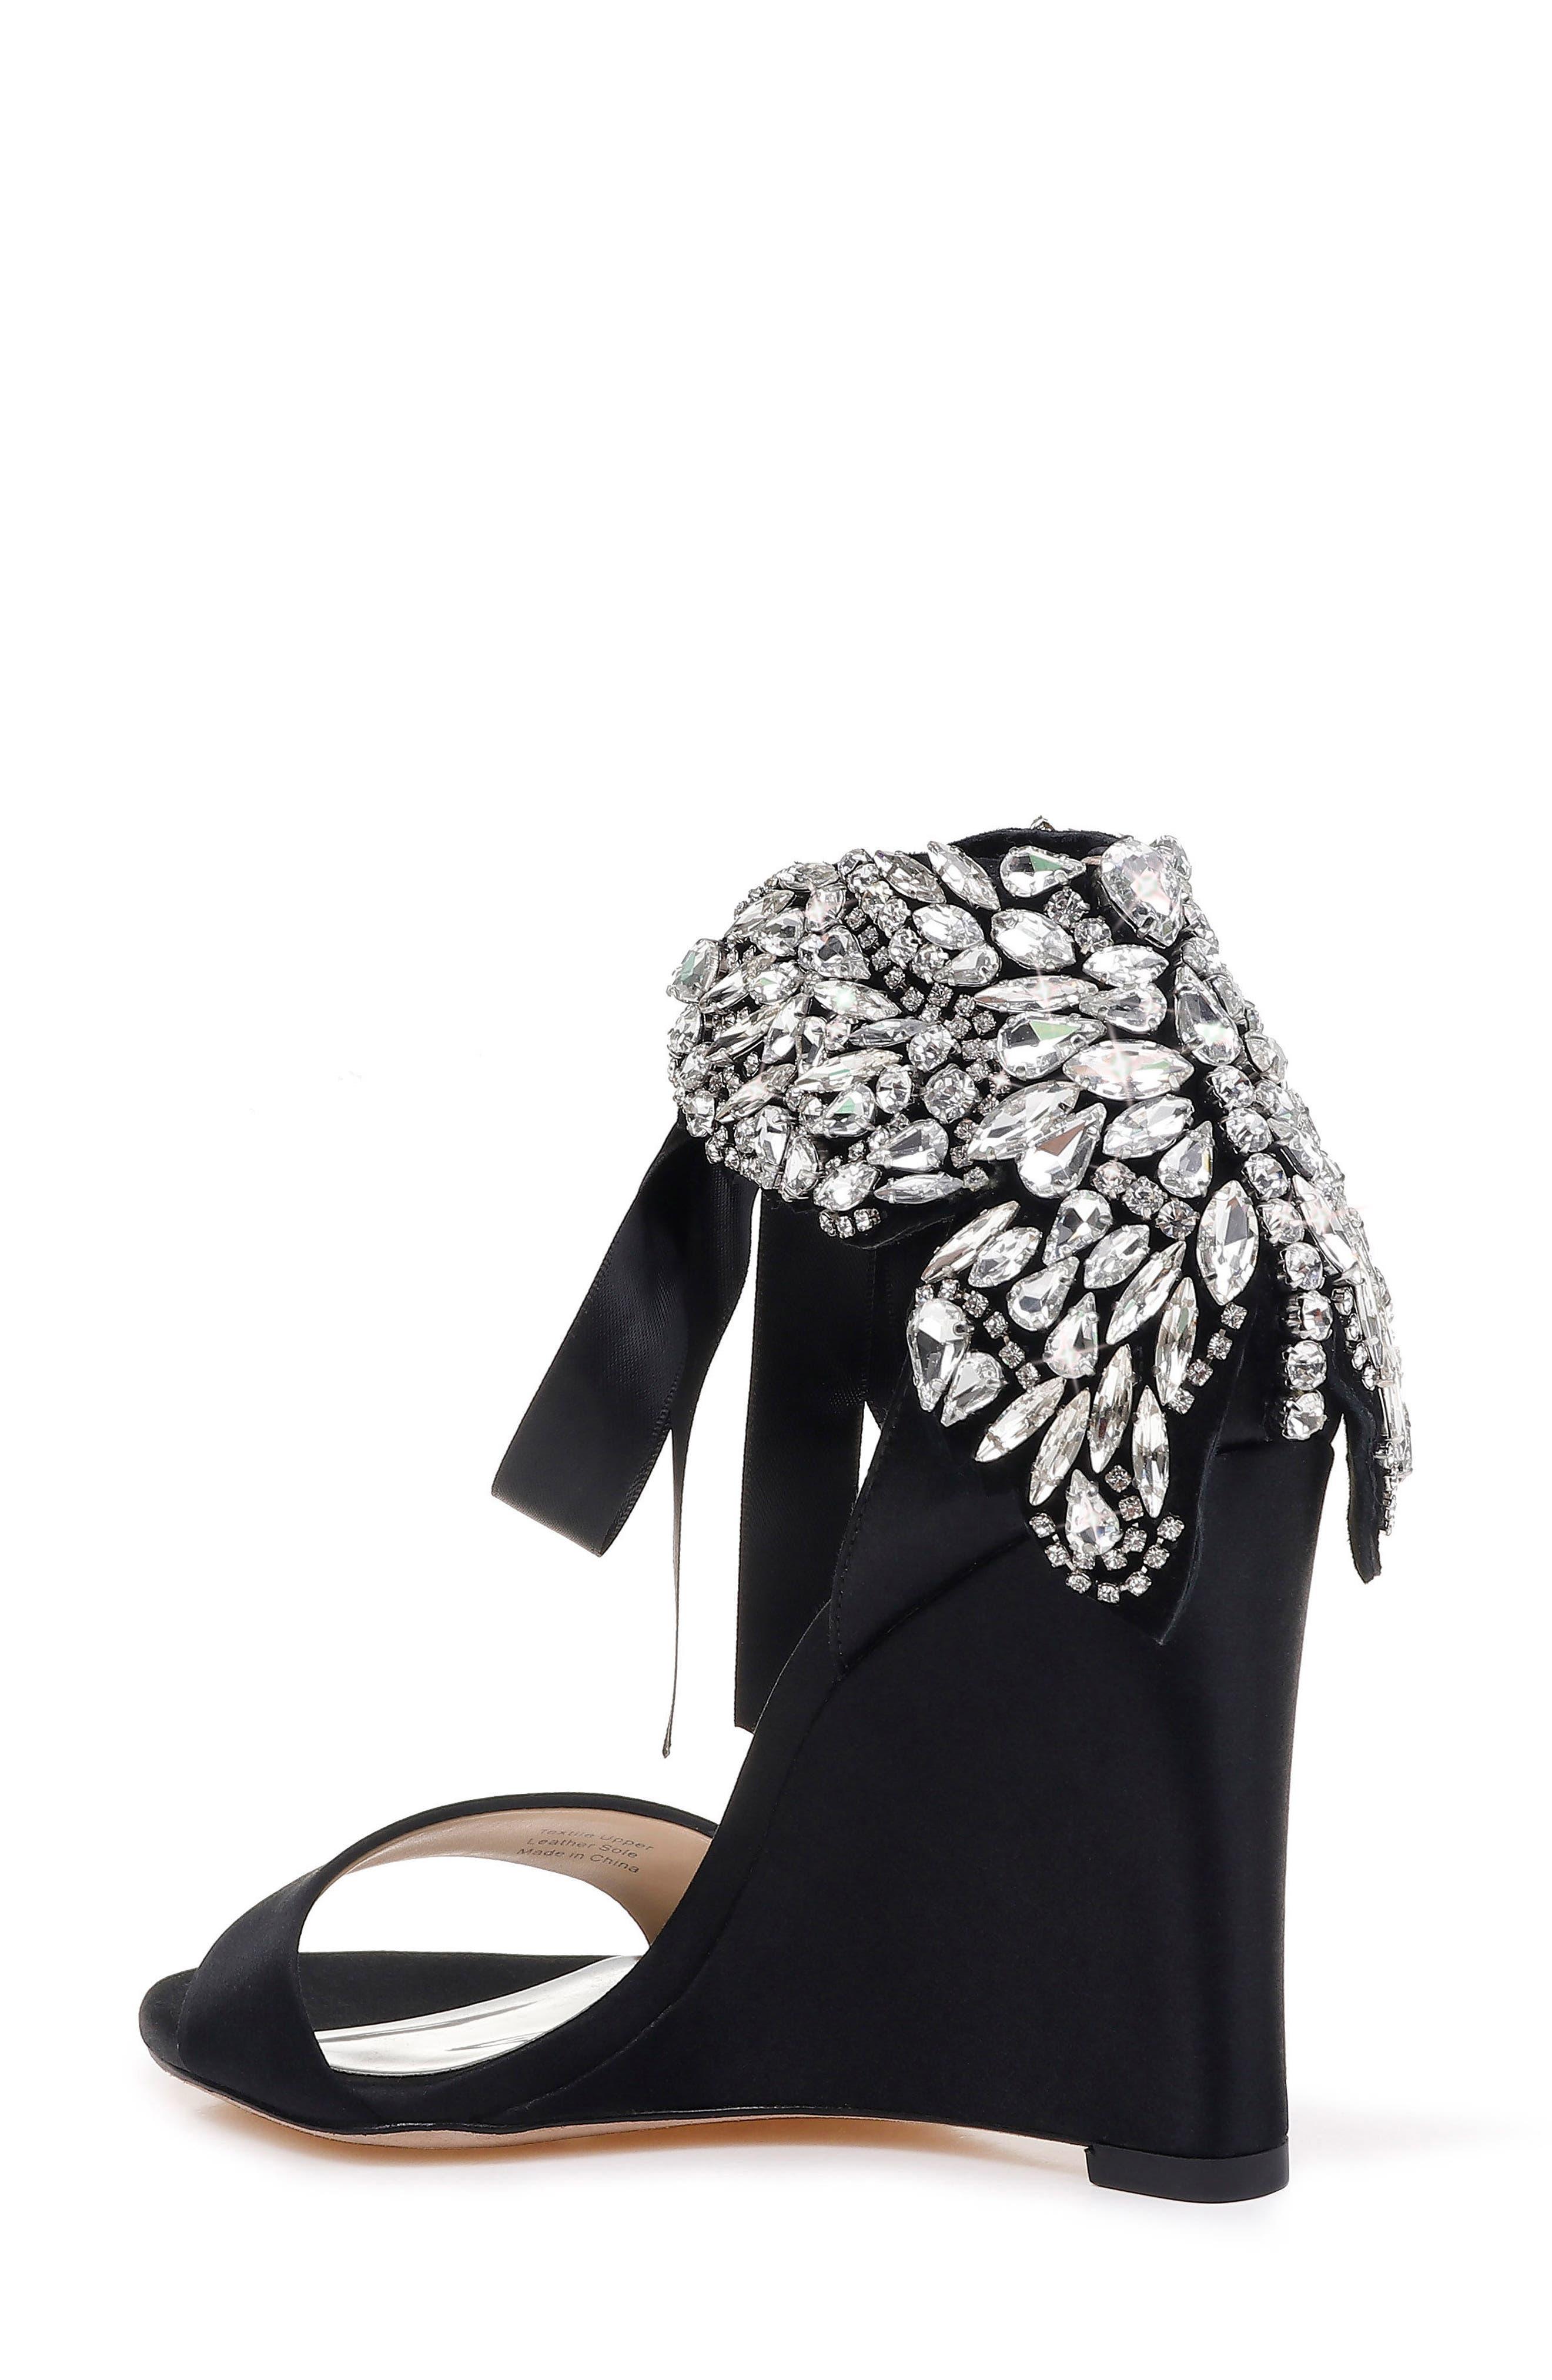 Badgley Mischka Heather Crystal Embellished Wedge,                             Alternate thumbnail 2, color,                             BLACK SATIN